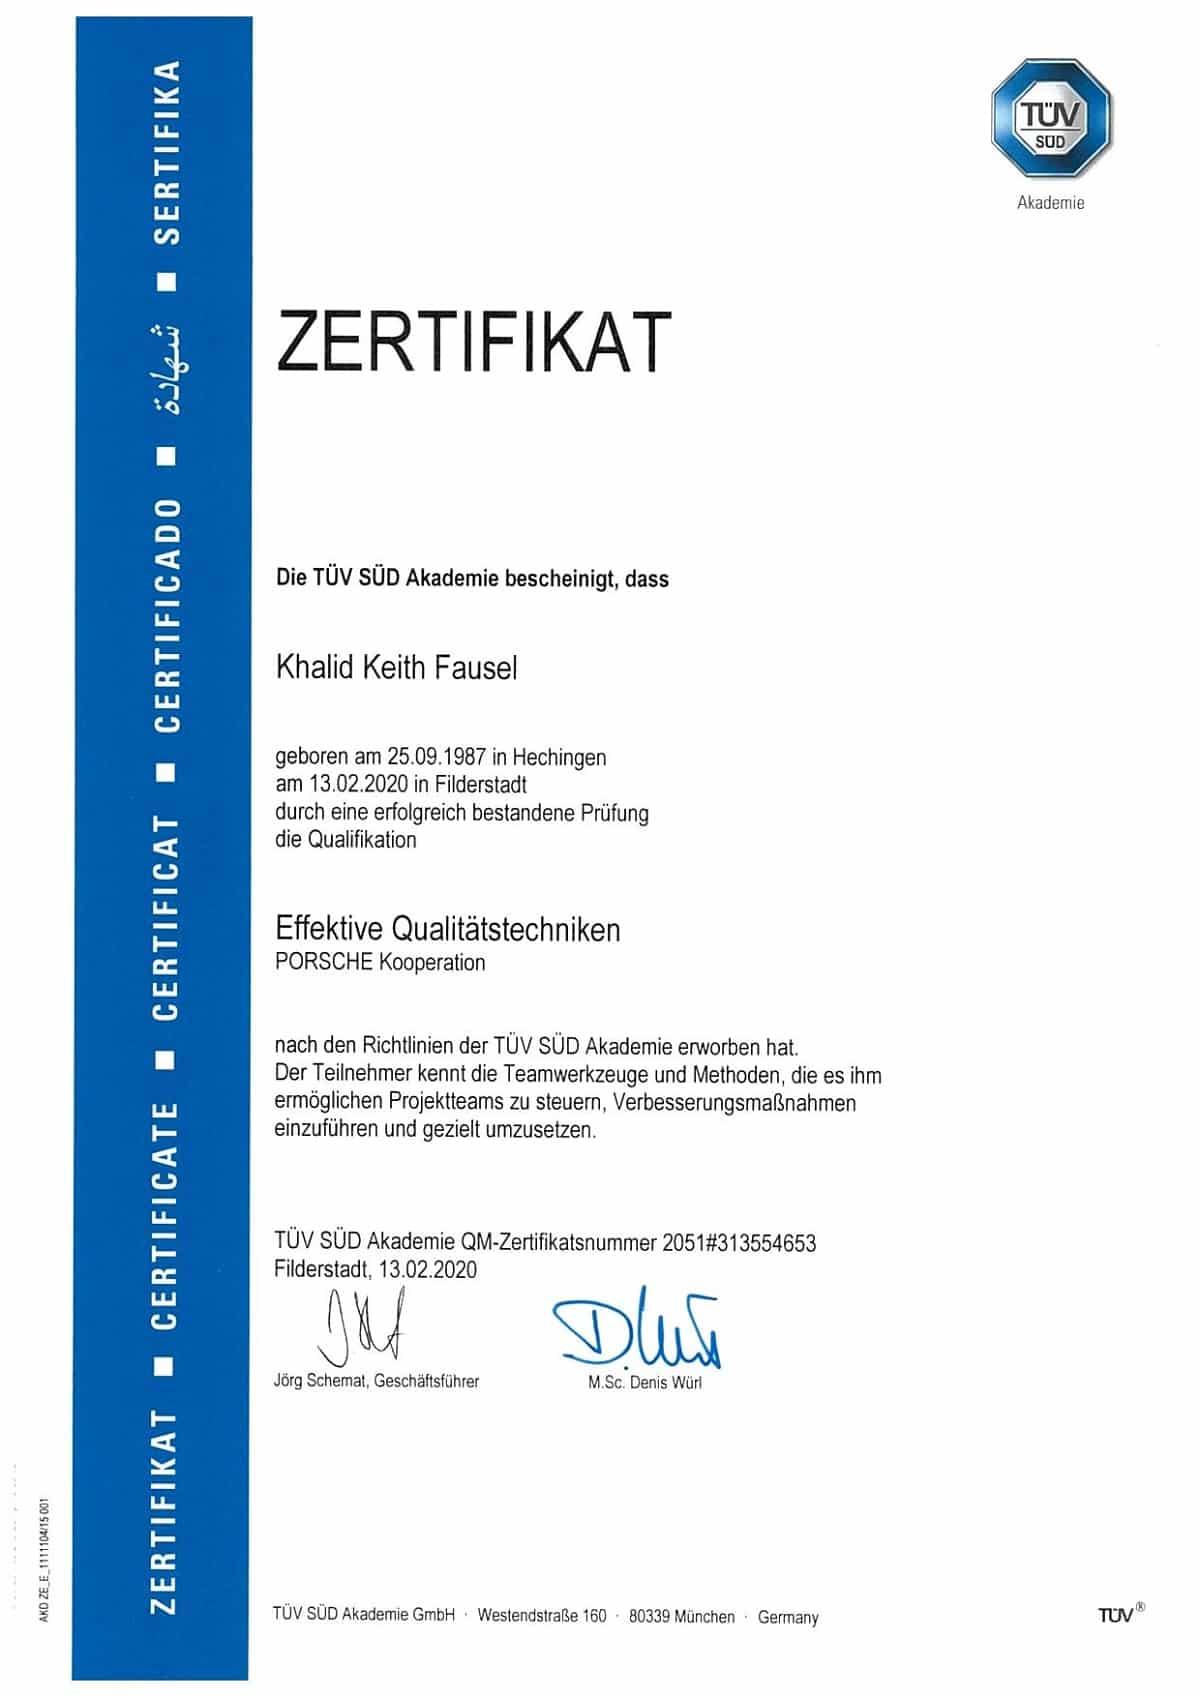 Zertifikat Tüv Akademie Khalid Fausel